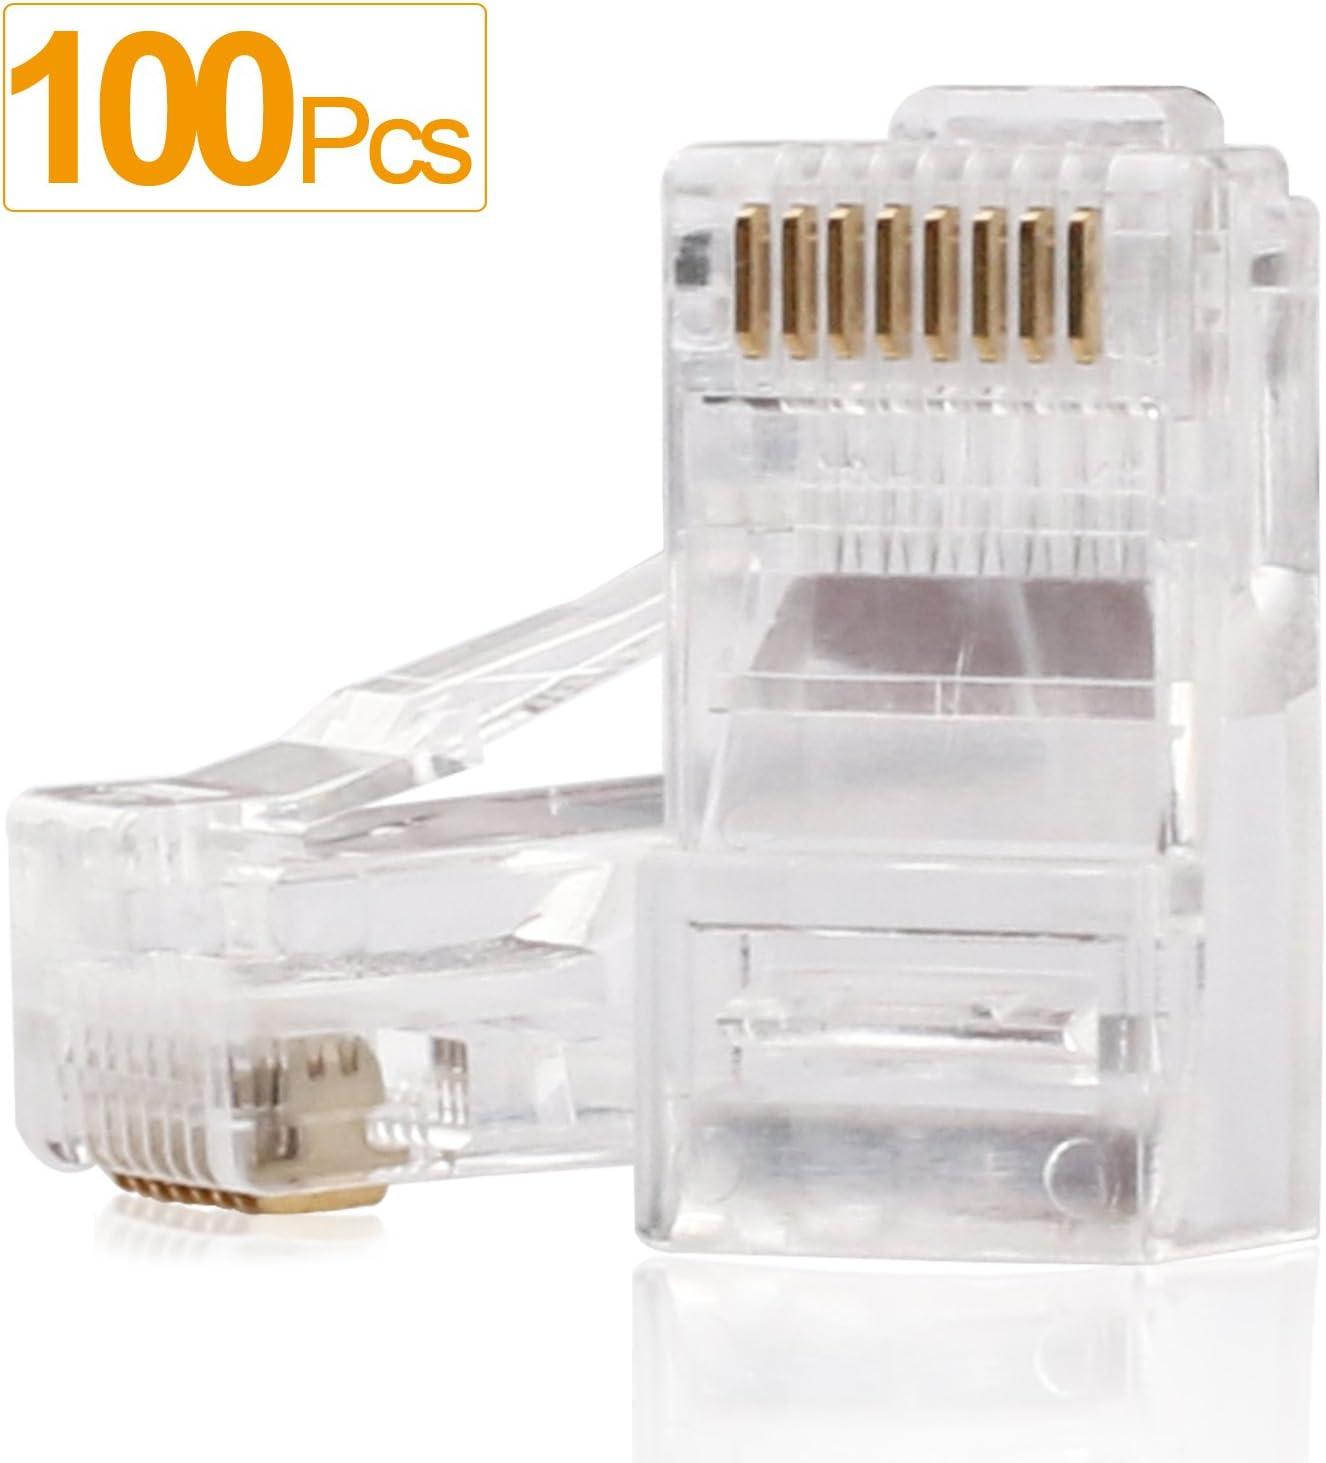 1 m RJ45 Plug Cat5e SANOXY Network Cables SNX-/ PS11237 Network Cable Blue RJ45 Plug 3.3 ft